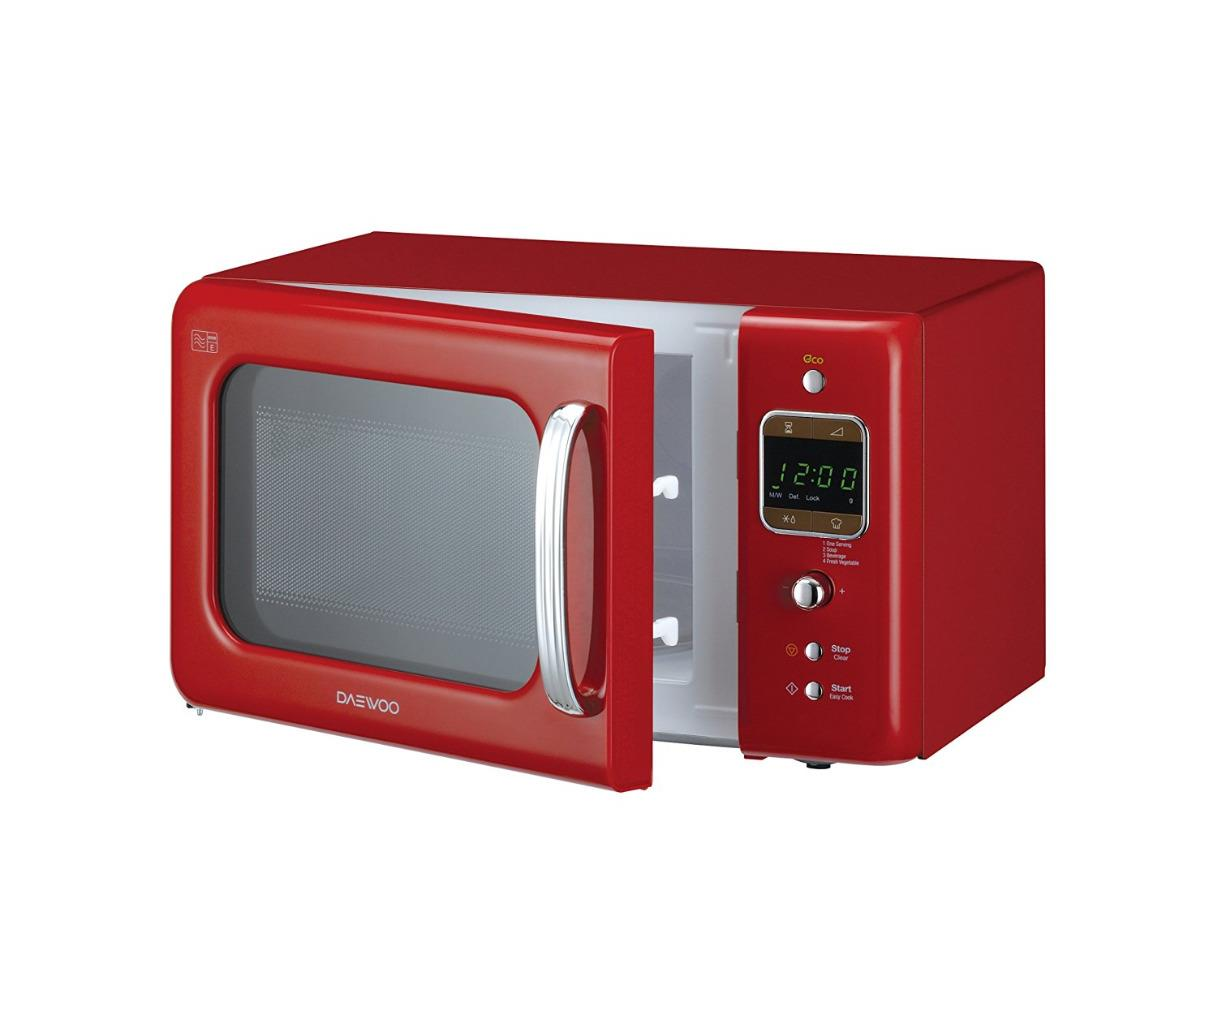 Daewoo Kor7lbkr Retro Style Free Standing Microwave 20l